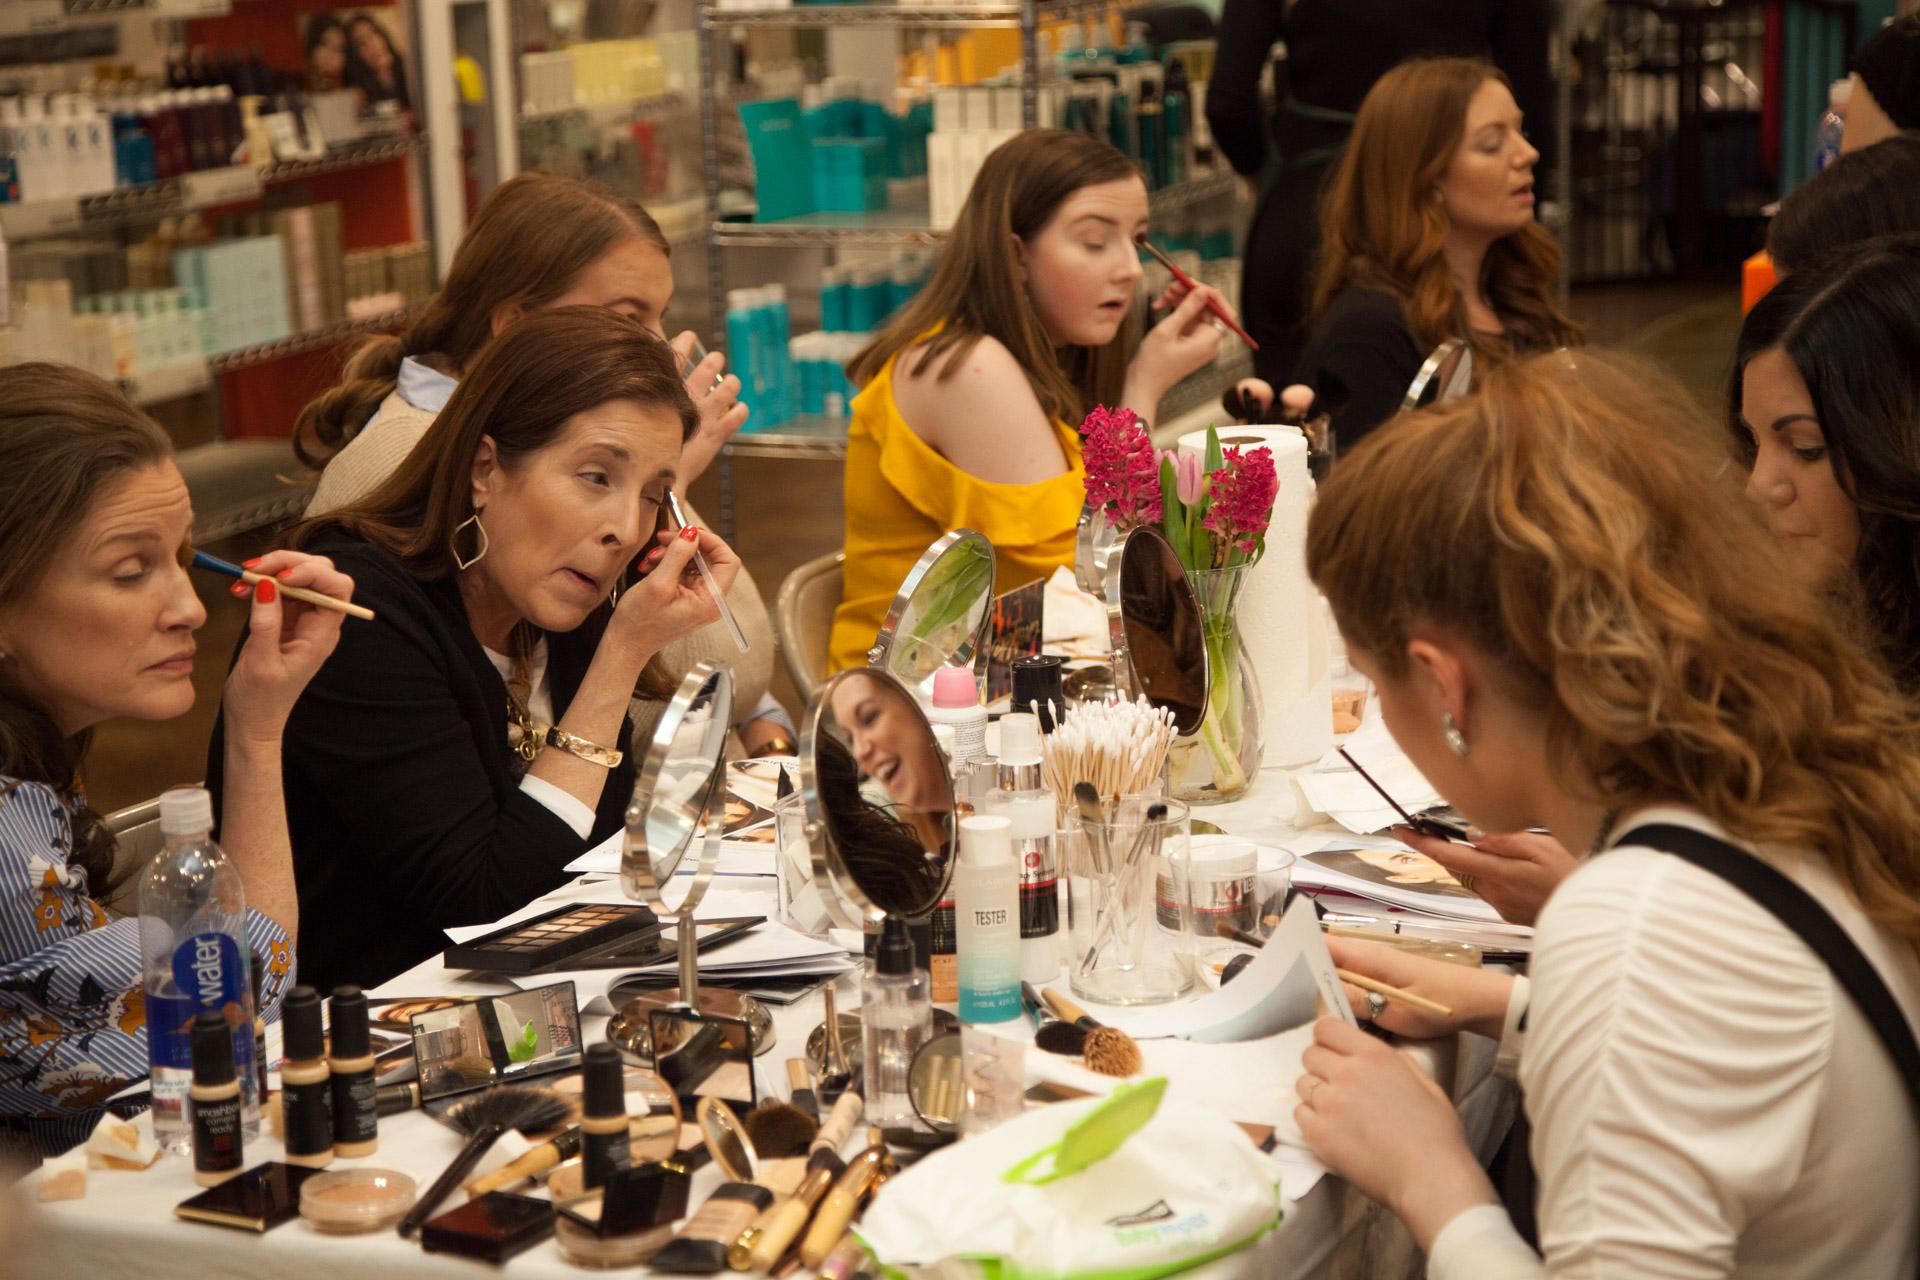 NFW_TheCosmeticMarket_BeautyWorkshop_DesireeCiara-20.jpg